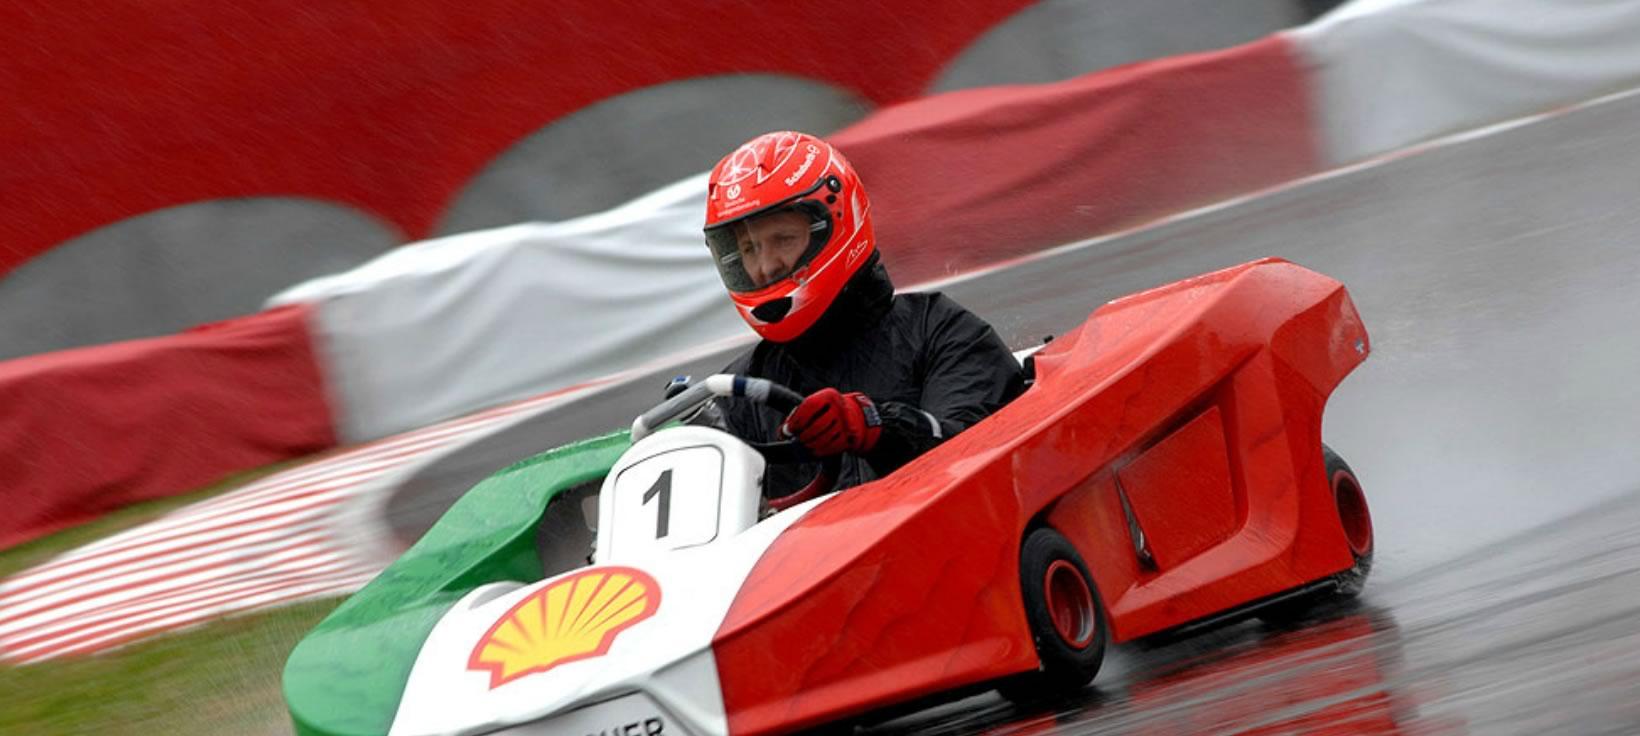 Michael Schumacher Karting